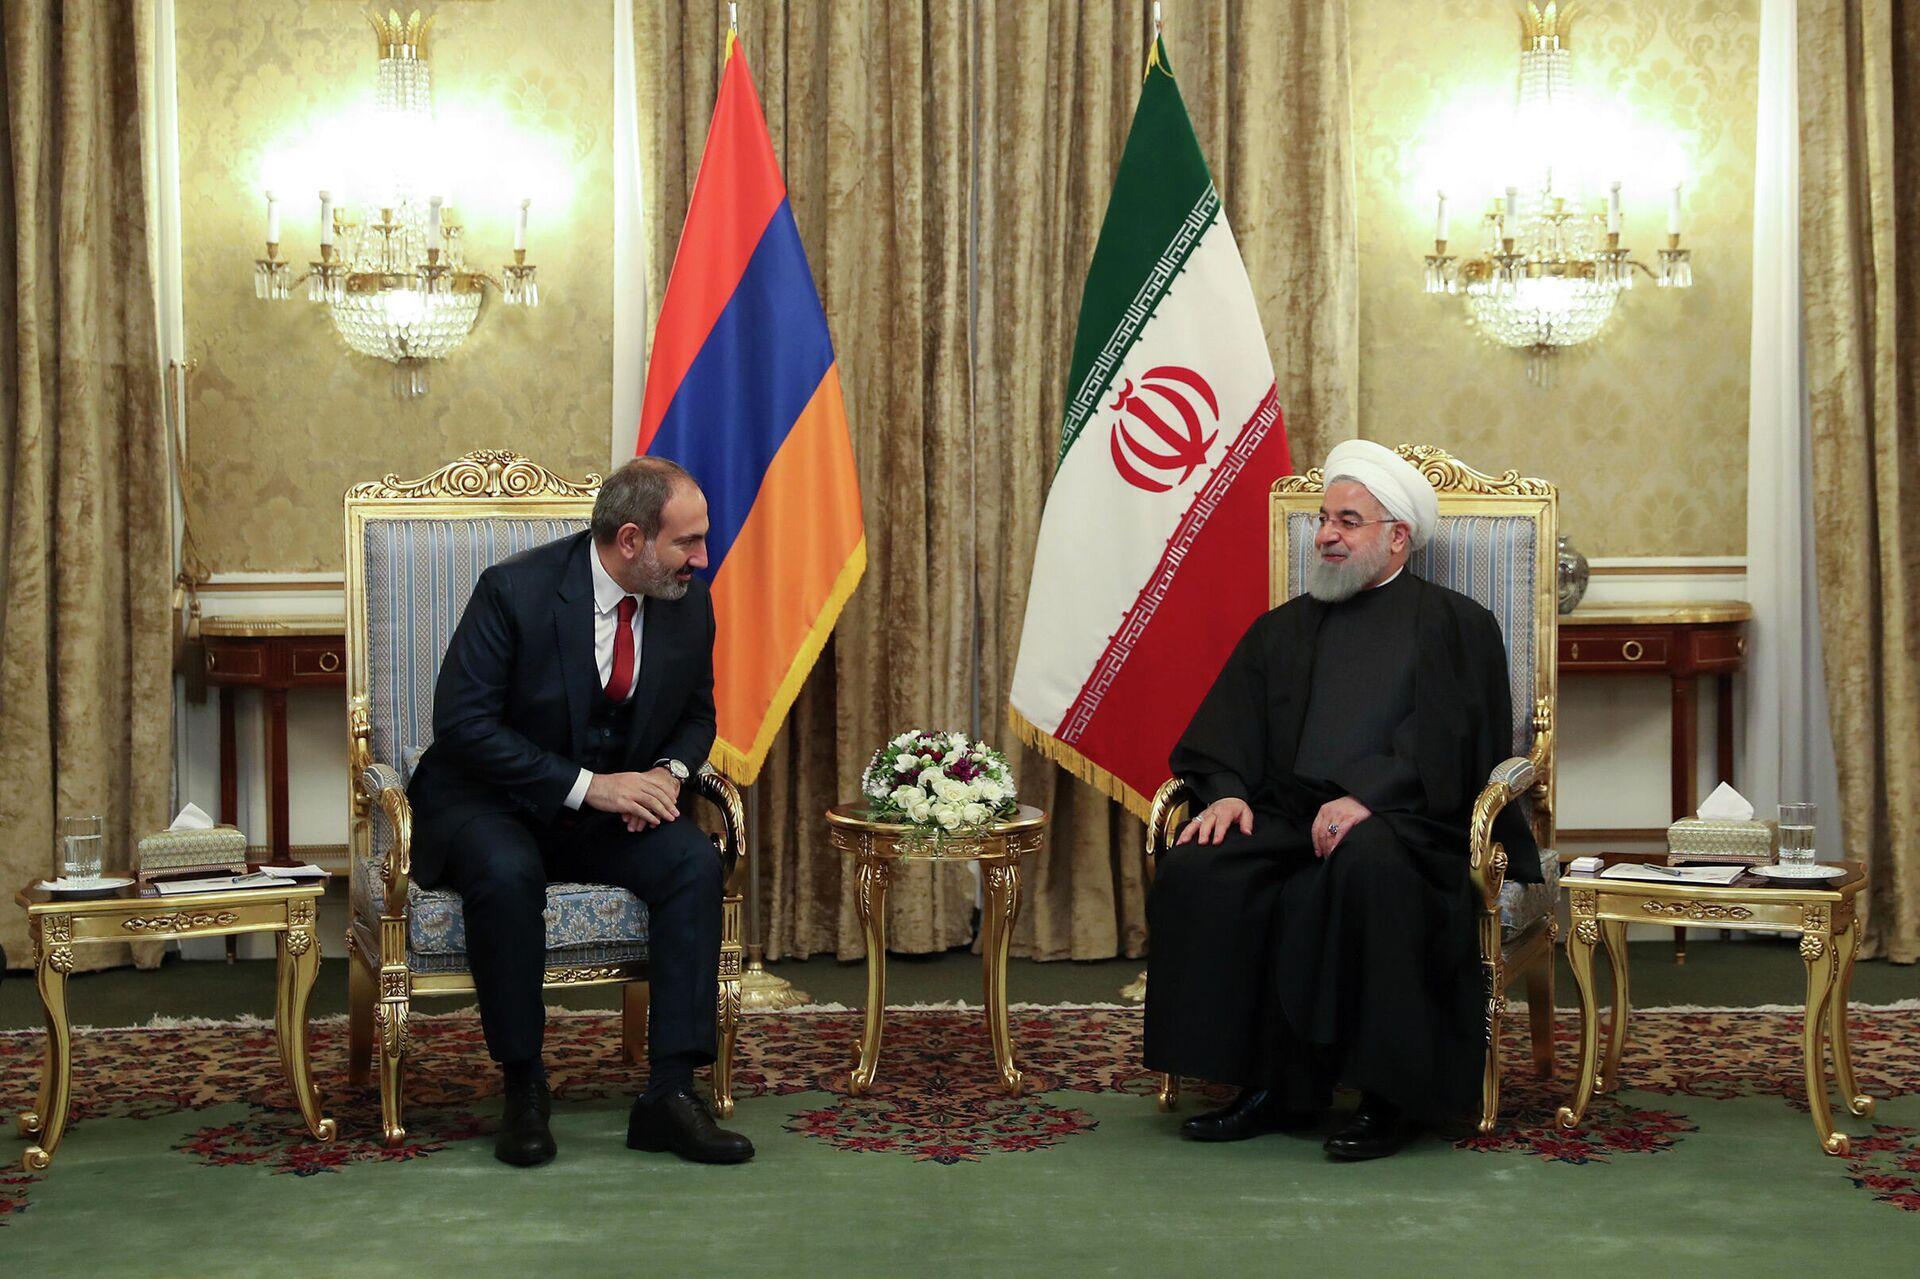 Премьер-министр Армении Армении Никол Пашинян и президент Ирана Хасан Роухани во время встречи в Тегеране, Иран  - РИА Новости, 1920, 16.10.2020